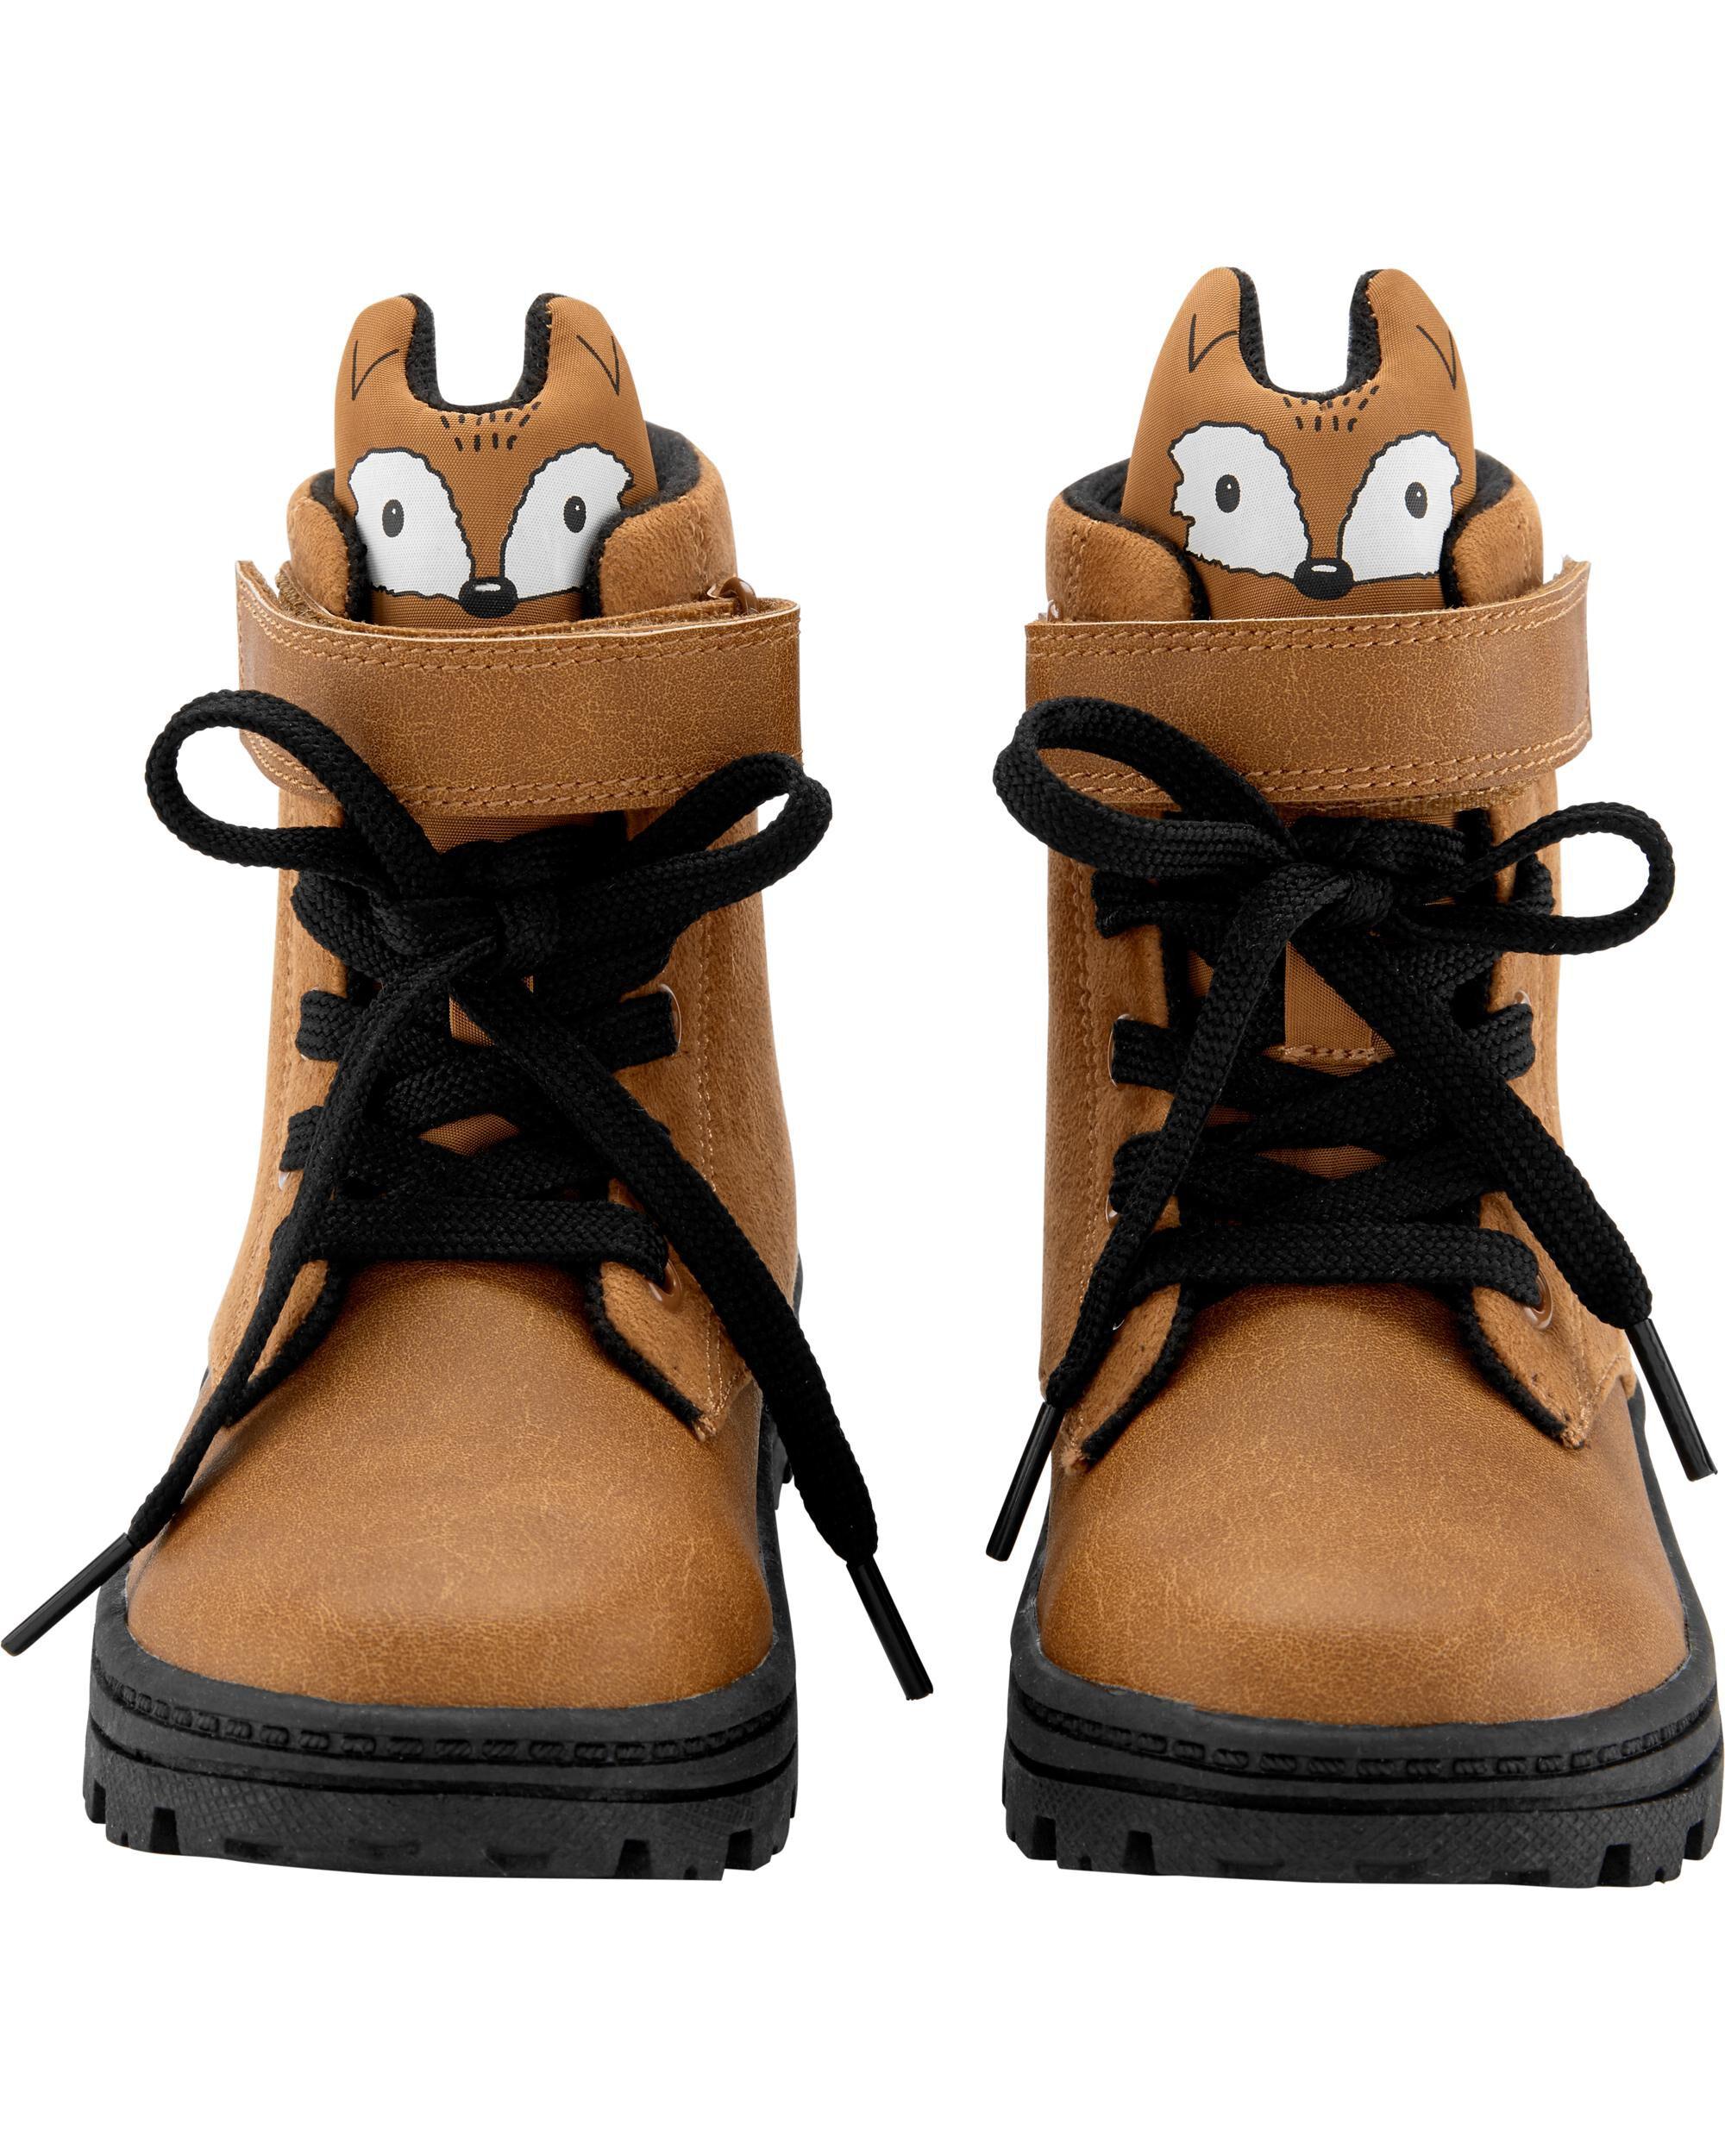 Carter's Fox Hiking Boots